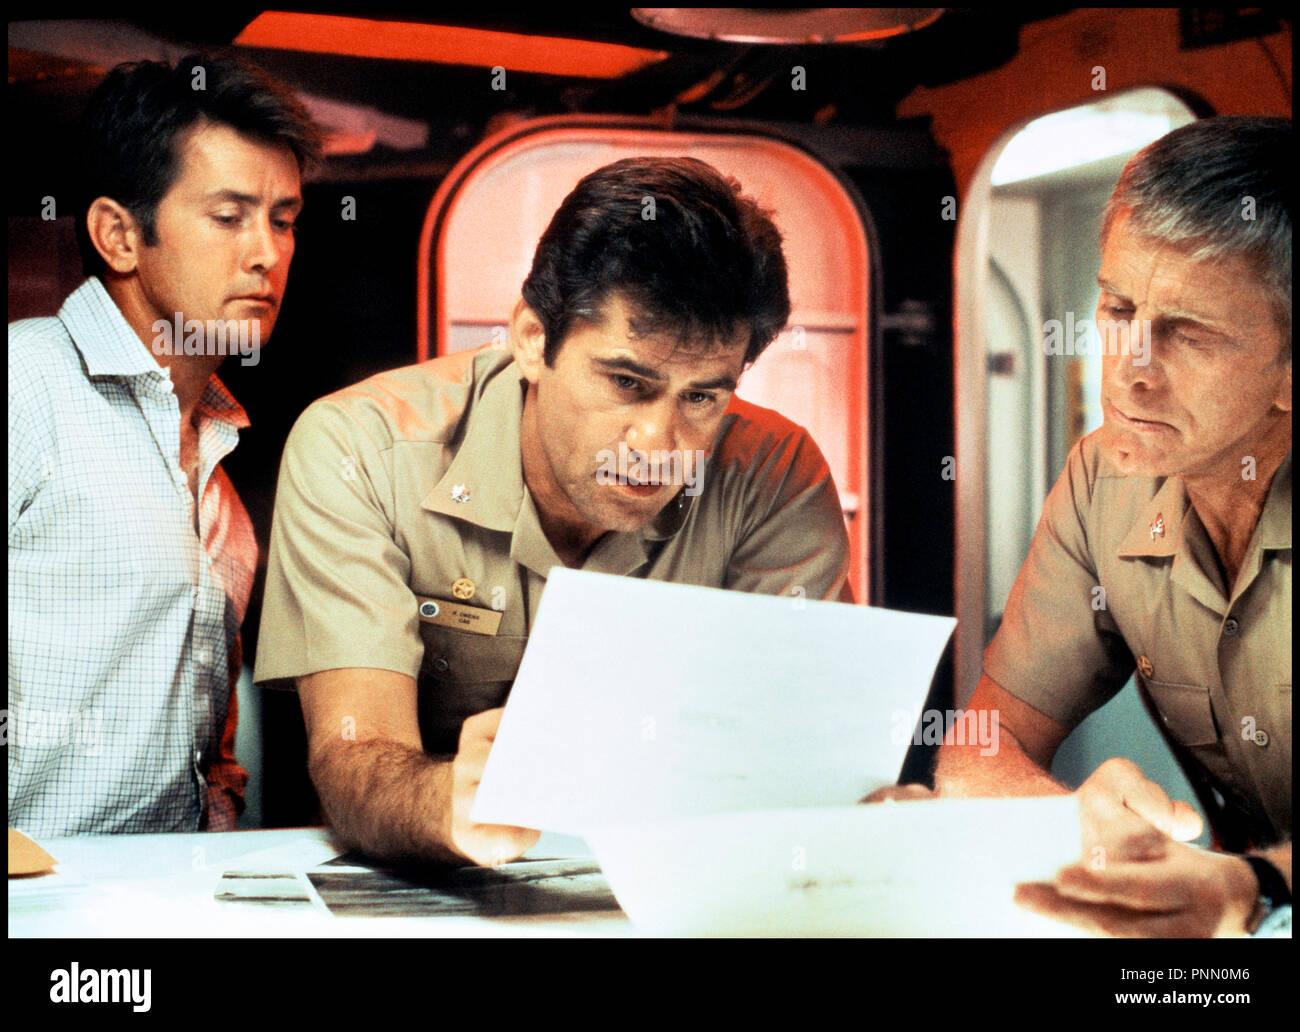 James farentino stock photos james farentino stock images alamy - Film porte avion voyage dans le temps ...